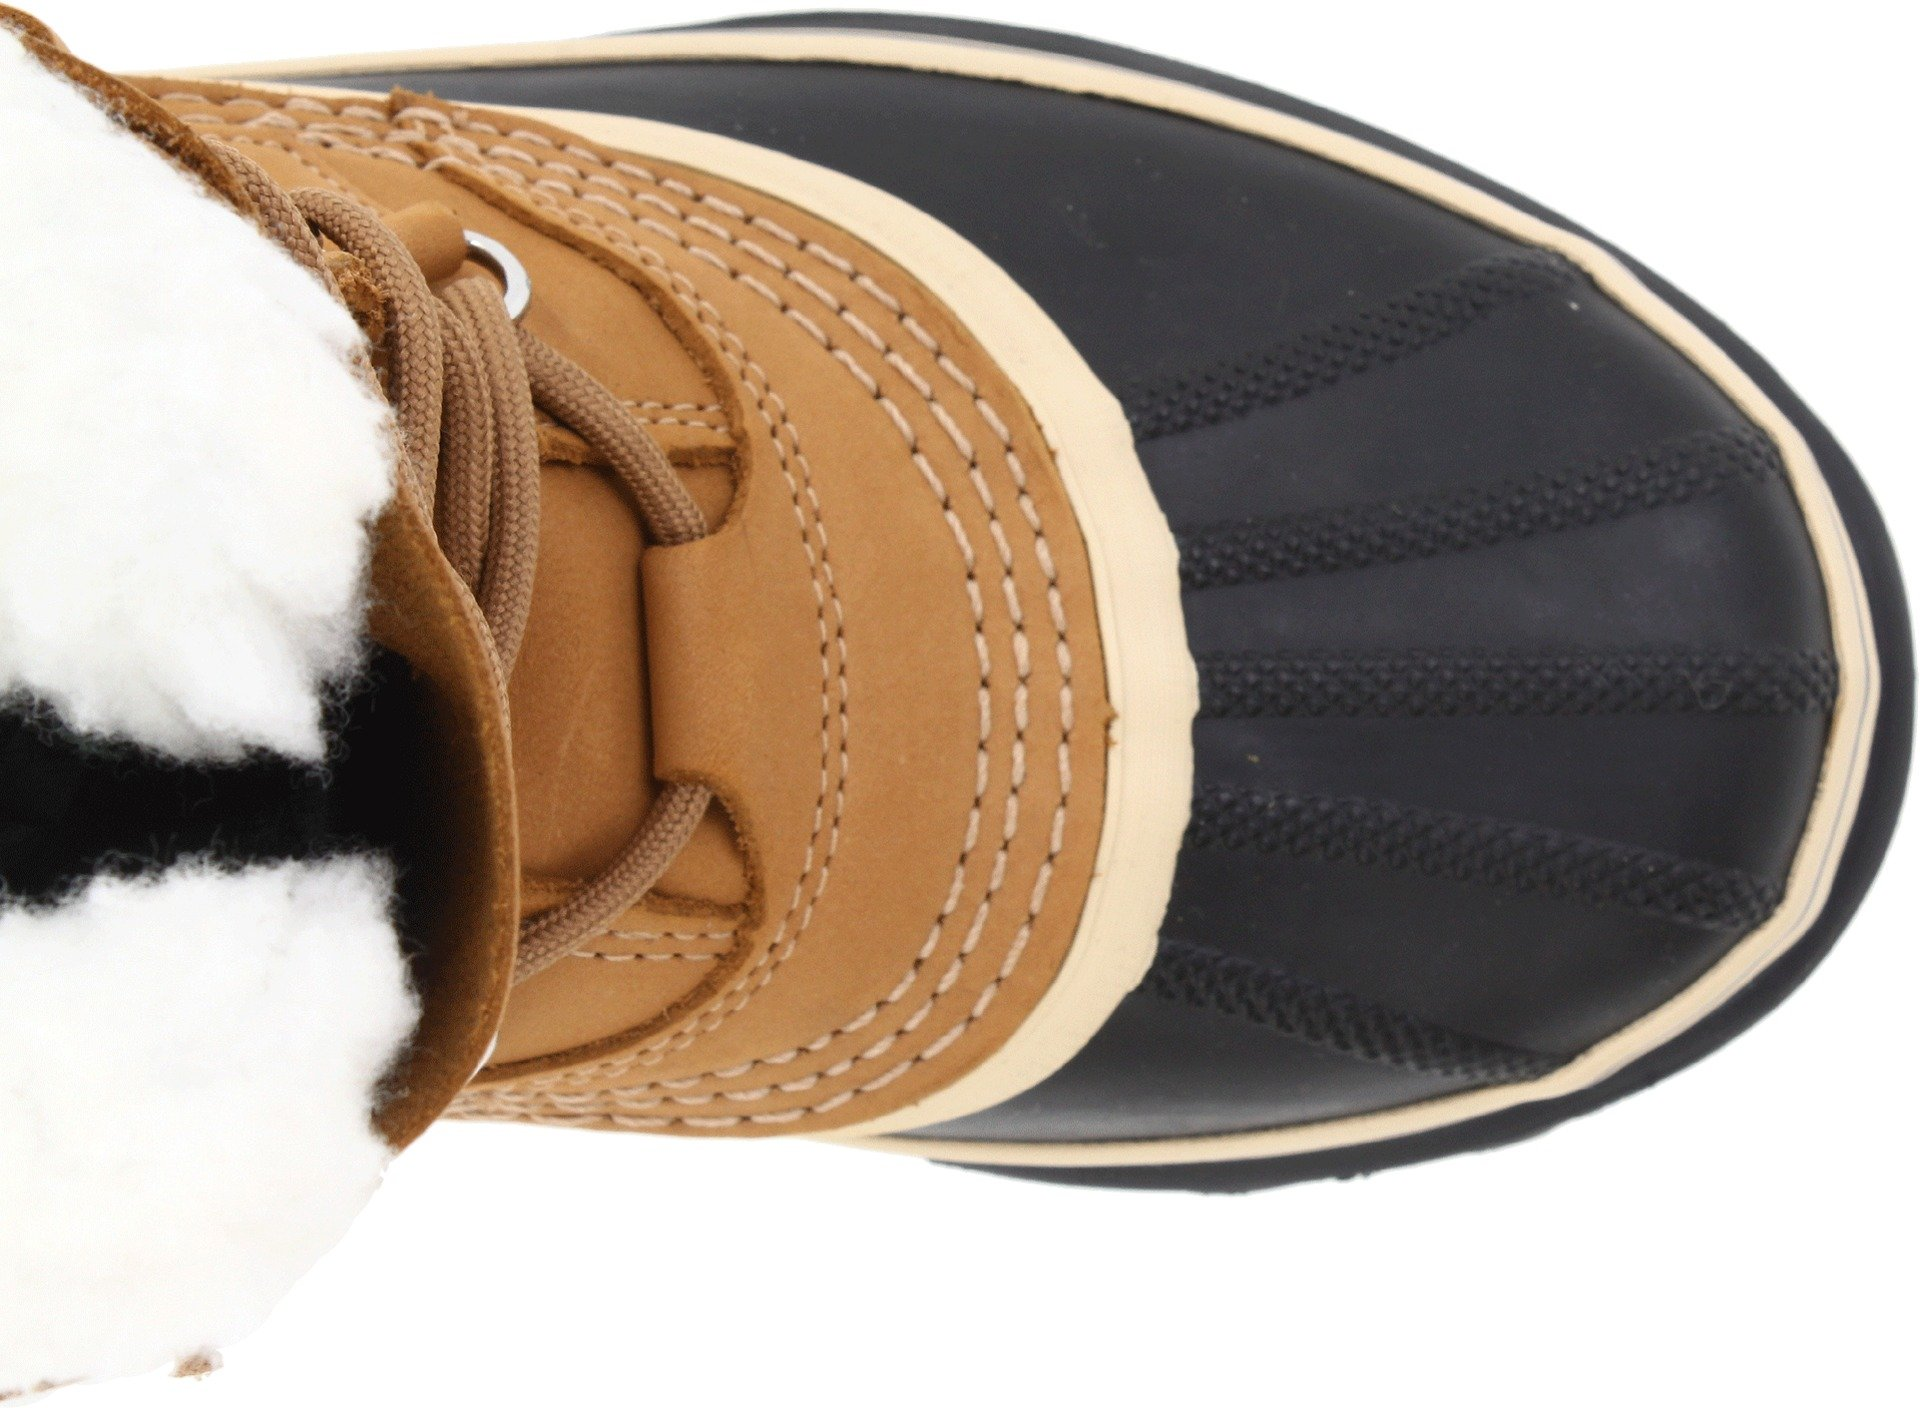 SOREL Women's Caribou NL1005 Boot,Buff,10 M by SOREL (Image #8)